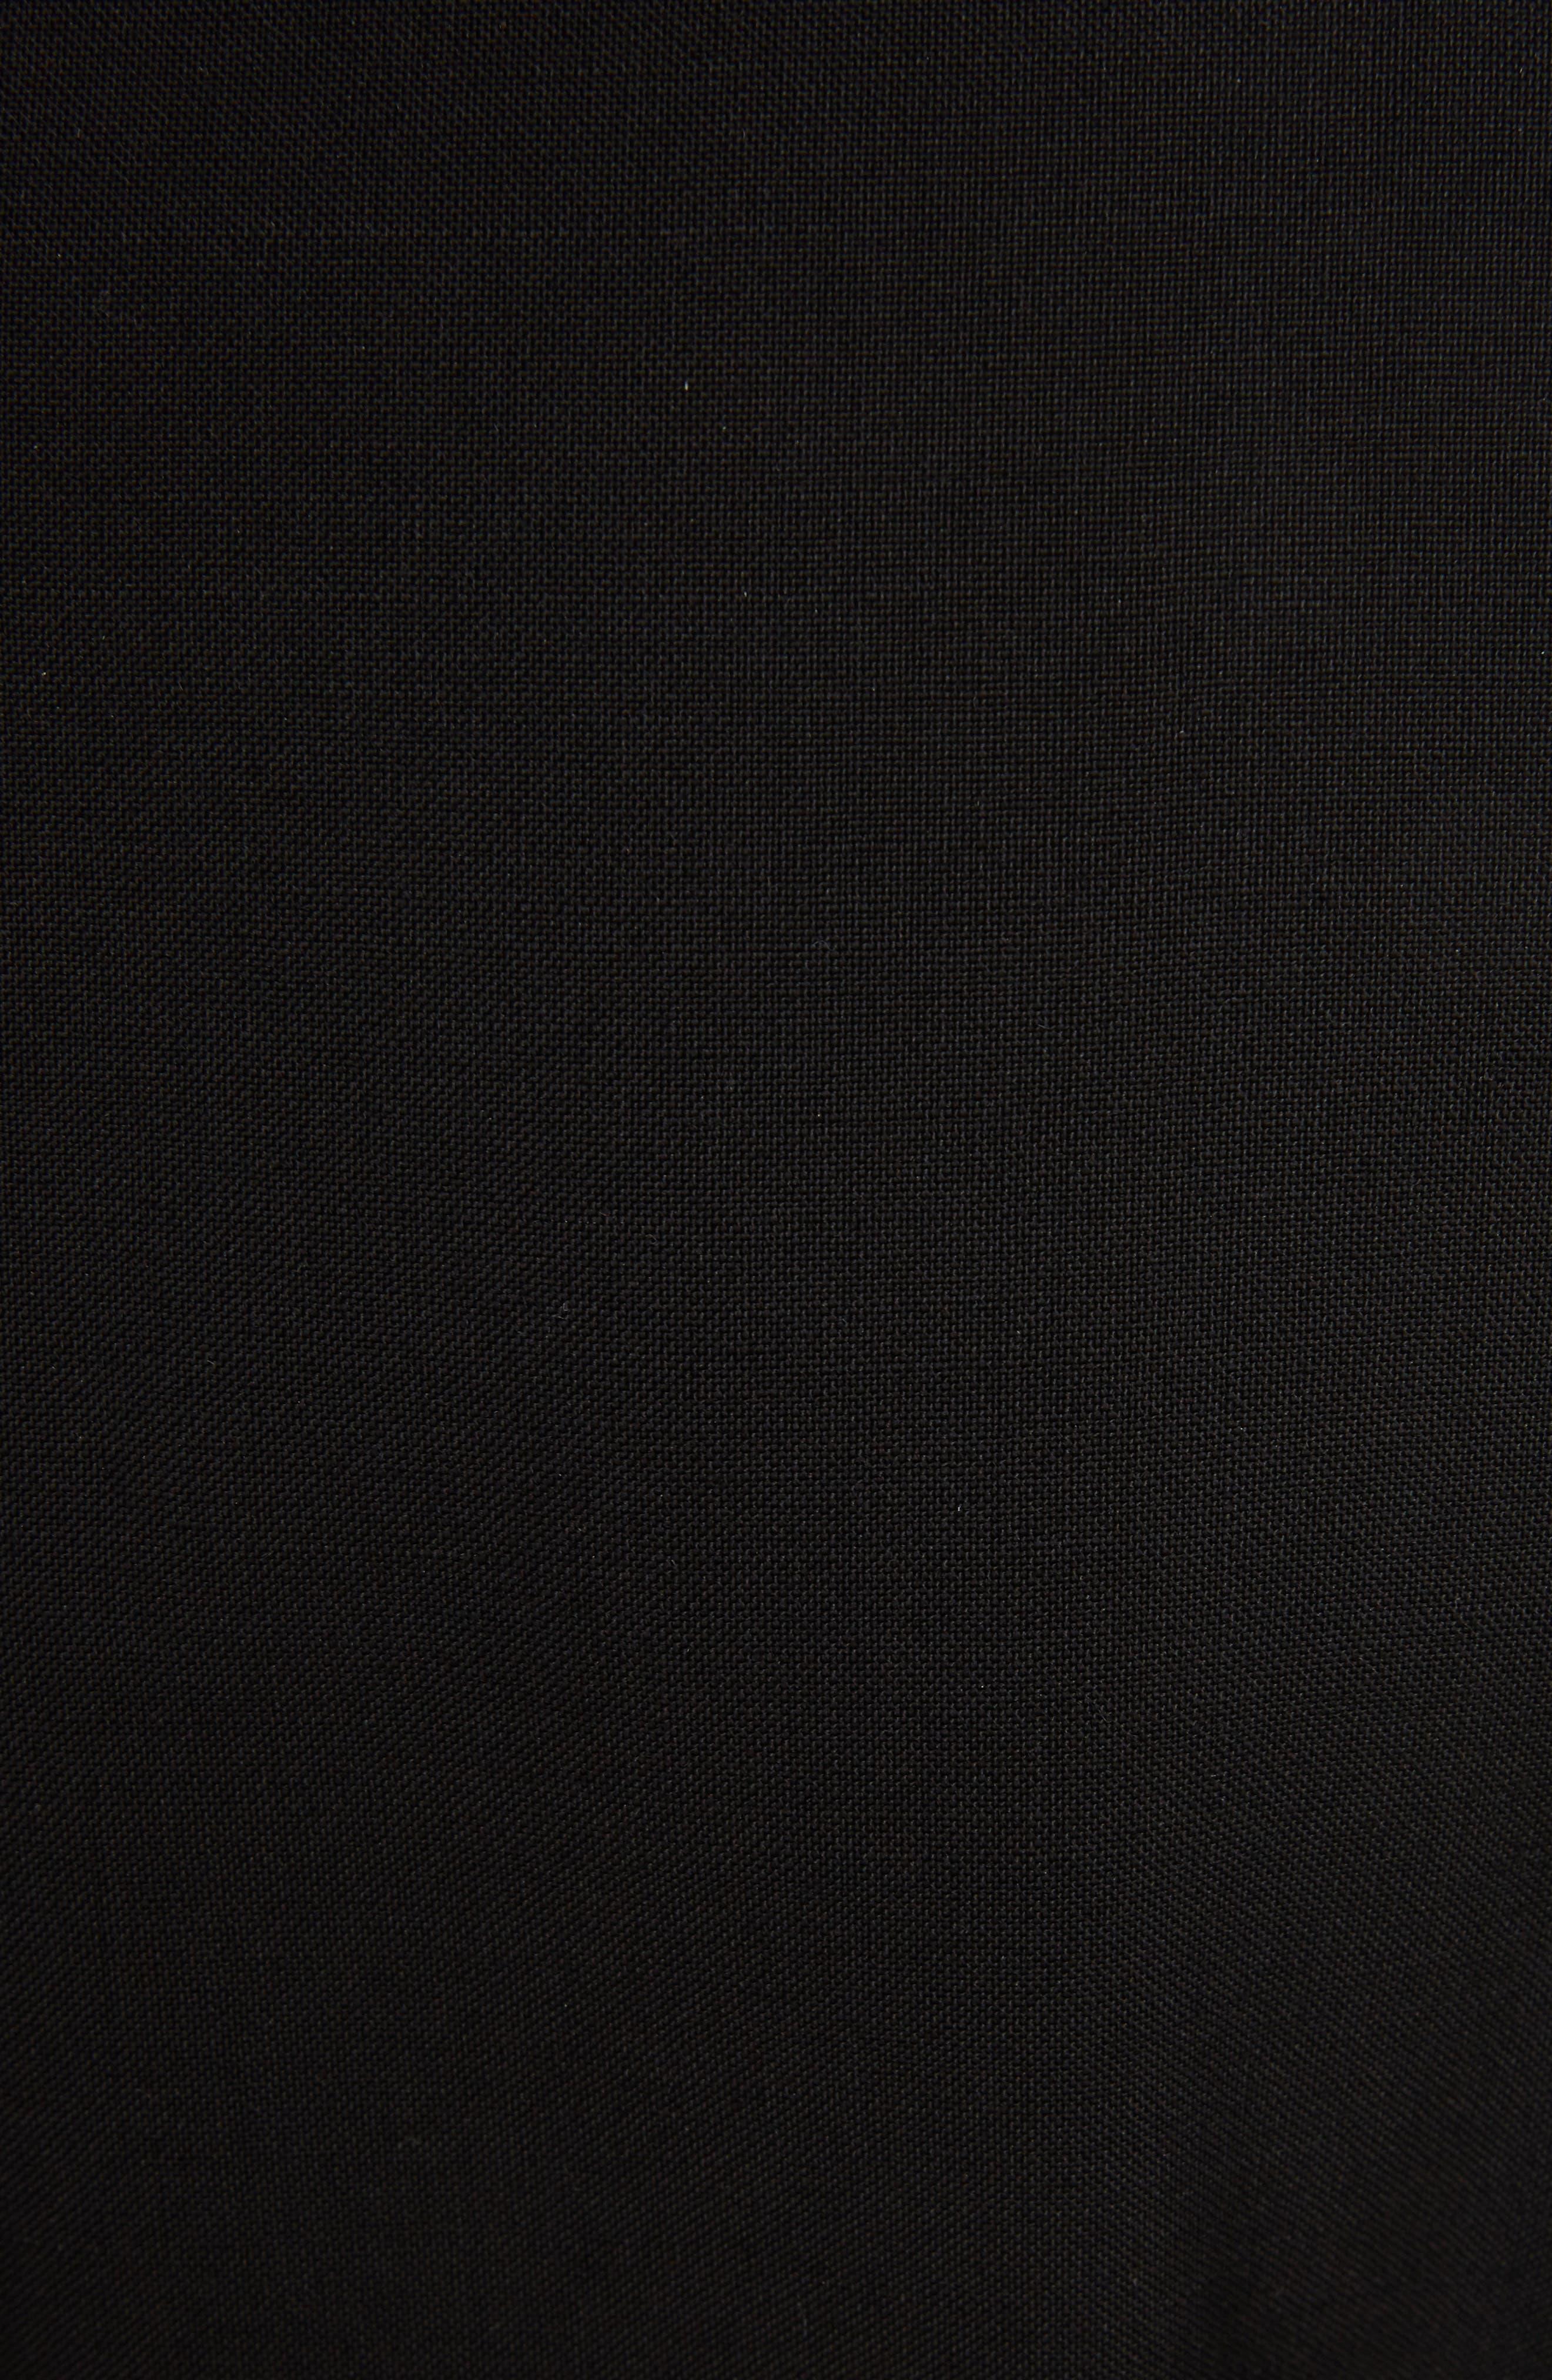 Wool & Mohair Brooch Detail Dress,                             Alternate thumbnail 5, color,                             Black